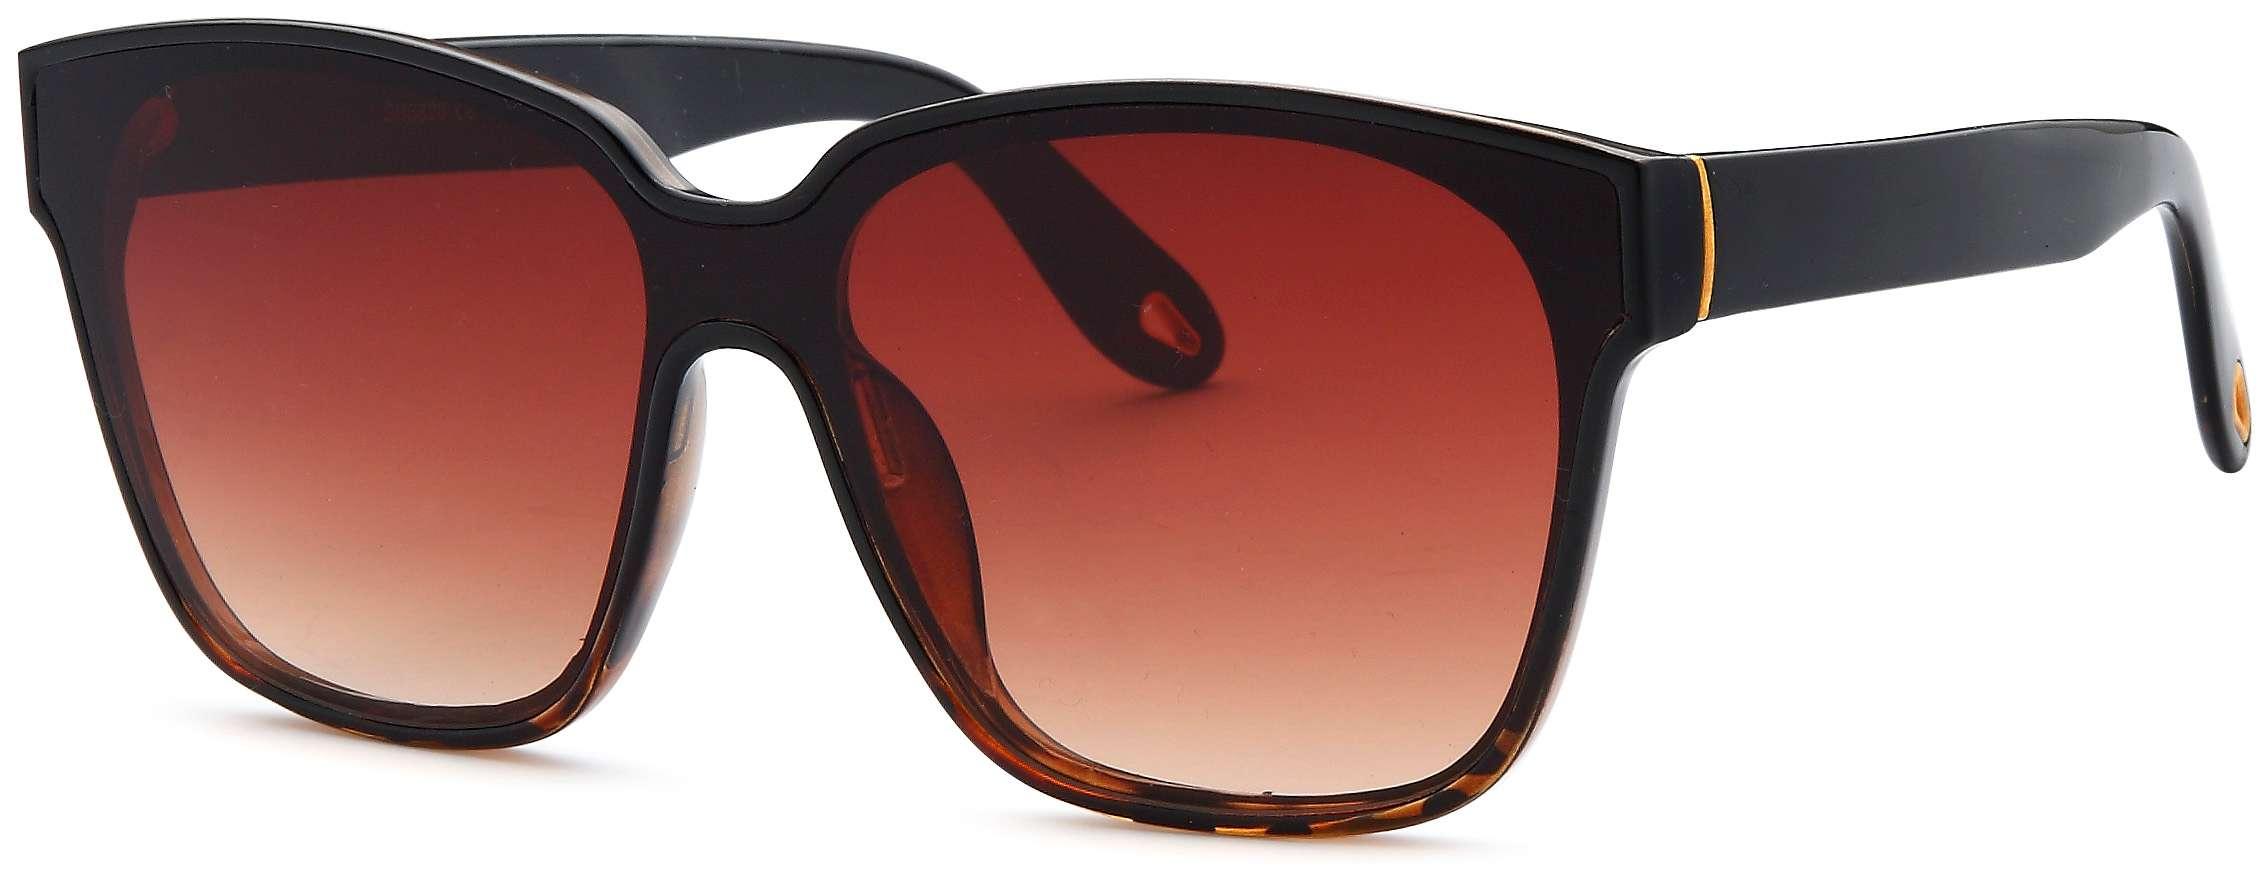 tortoise women fashion sunglasses